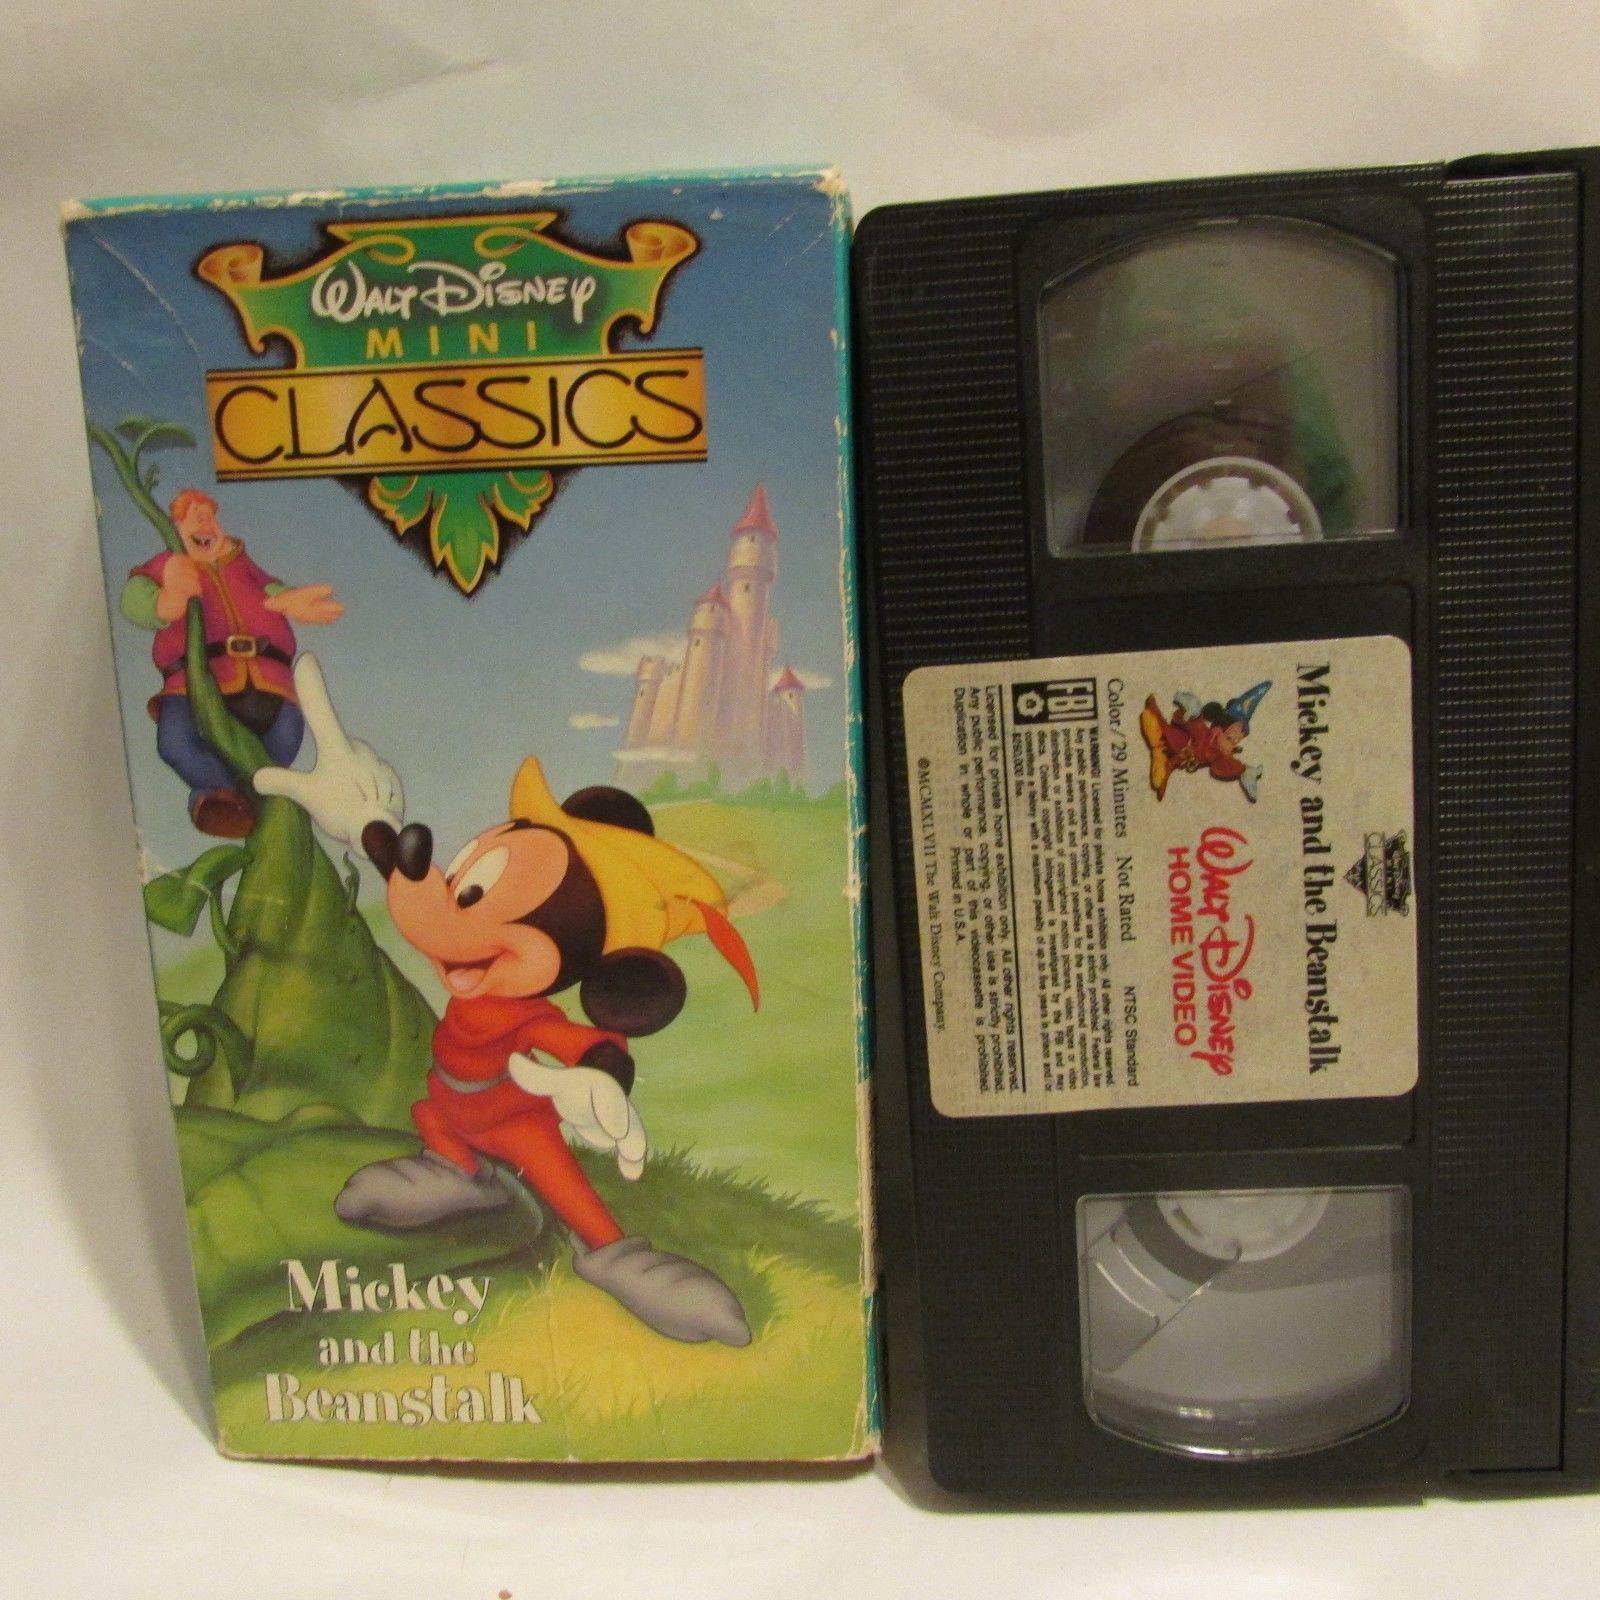 MICKEY AND THE BEANSTALK VHS WALT DISNEY MINI CLASSIC MICKEY MOUSE RARE  VIDEO  9b852b7cb